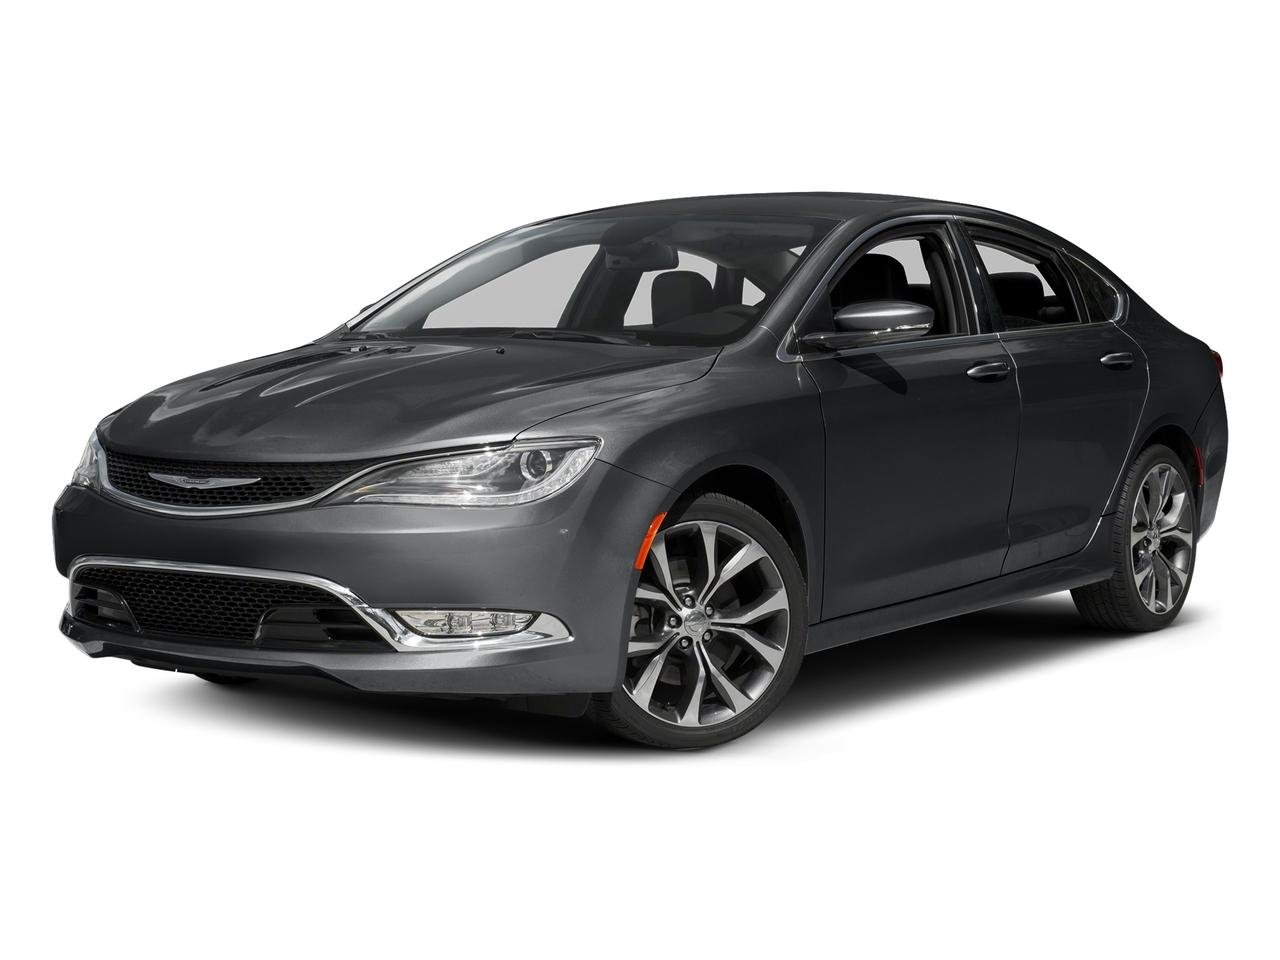 2016 Chrysler 200 Vehicle Photo in Beaufort, SC 29906